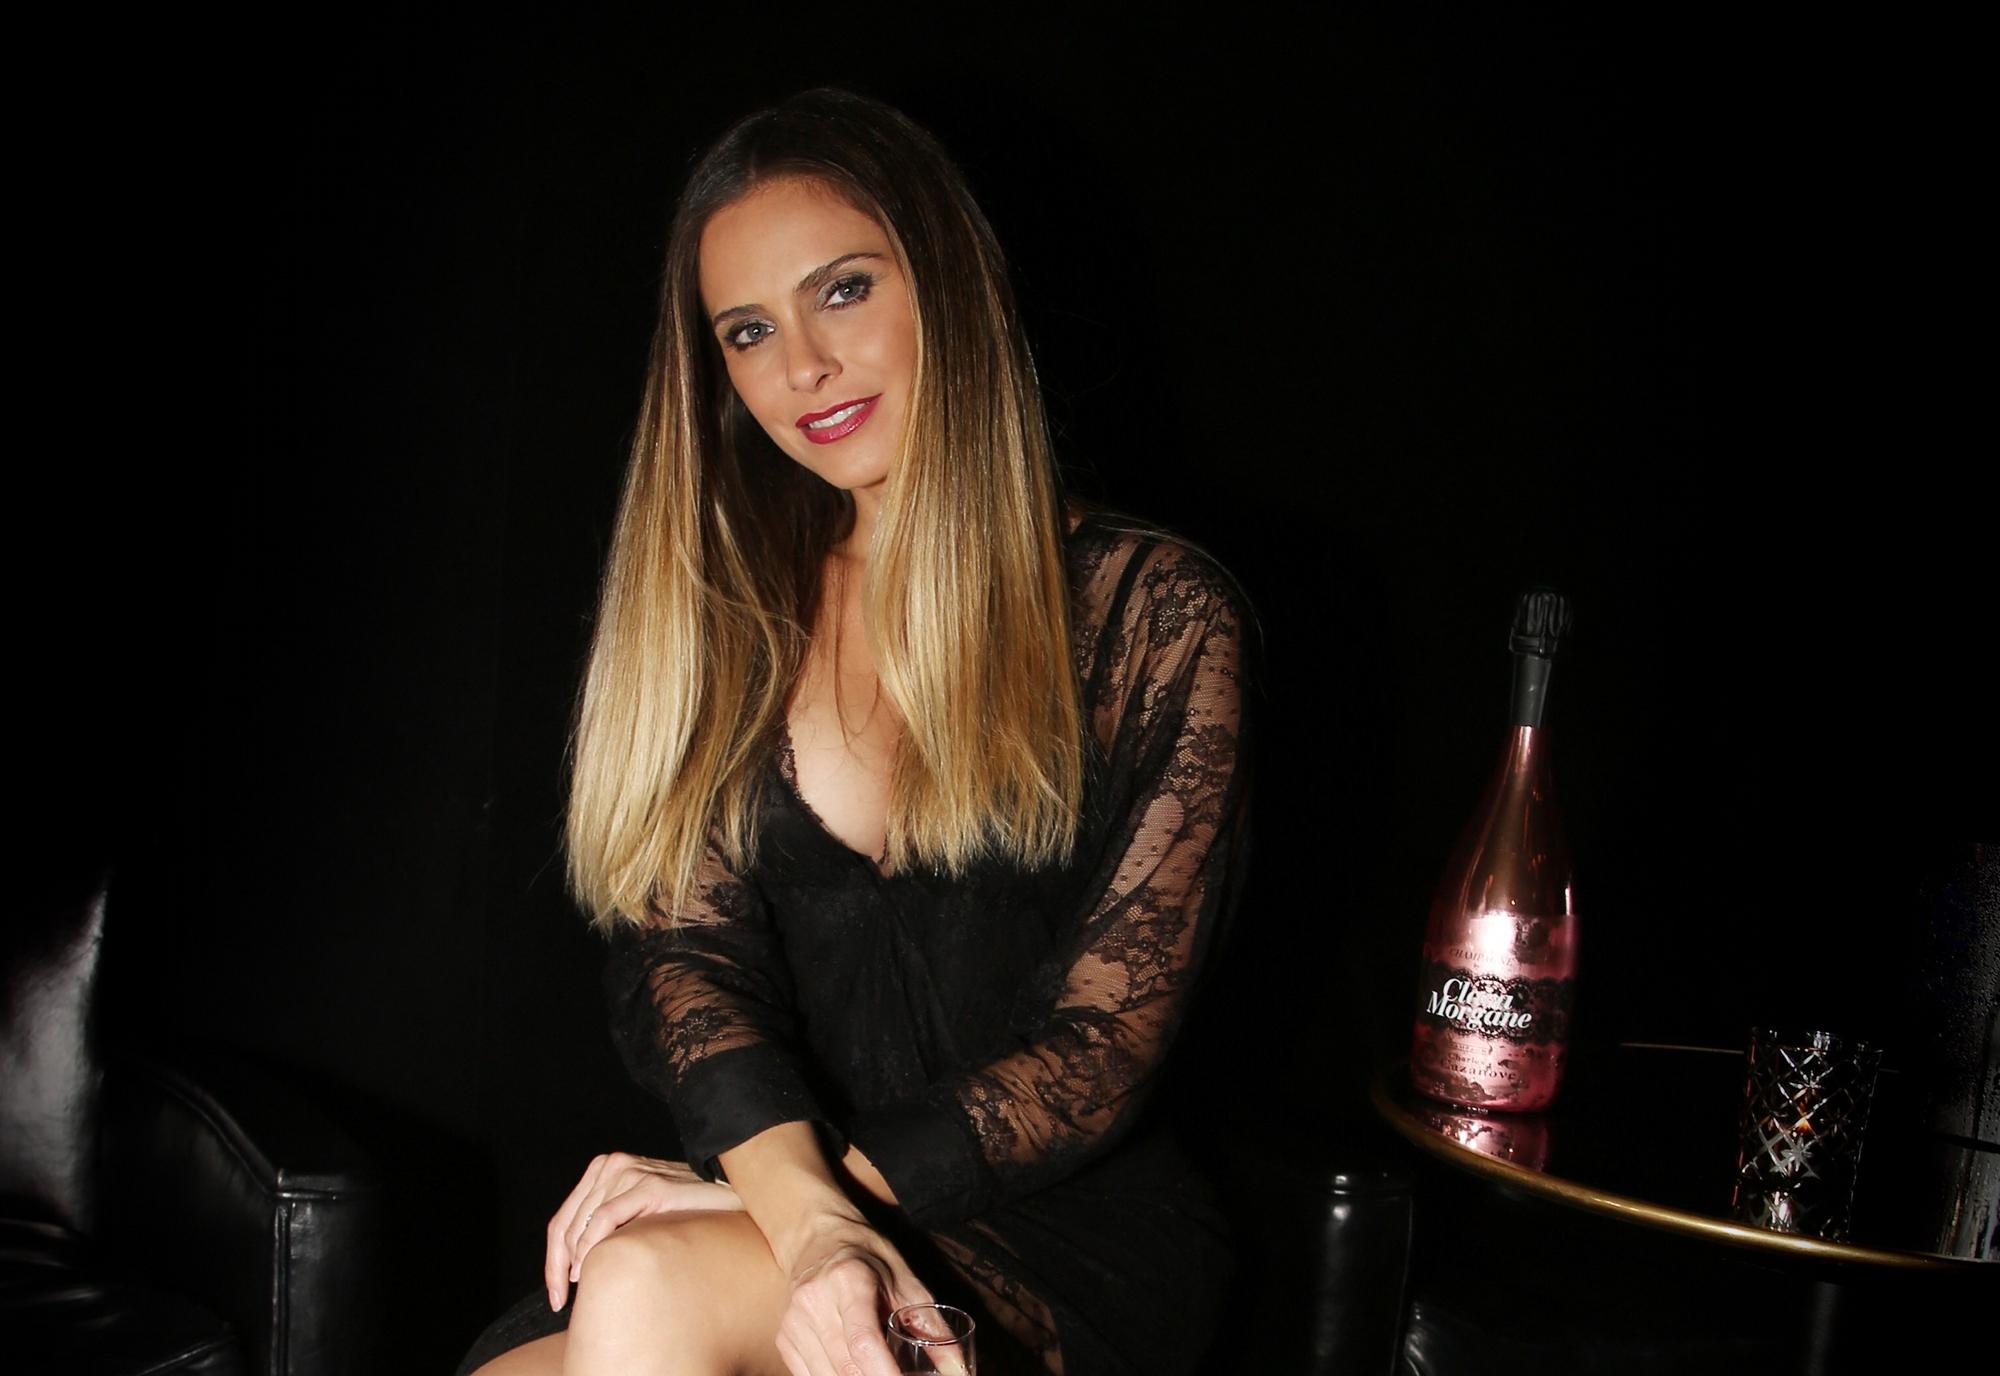 Calendrier 2020 De Clara Morgane.Champagne Clara Morgane Rhabille Charles De Cazanove